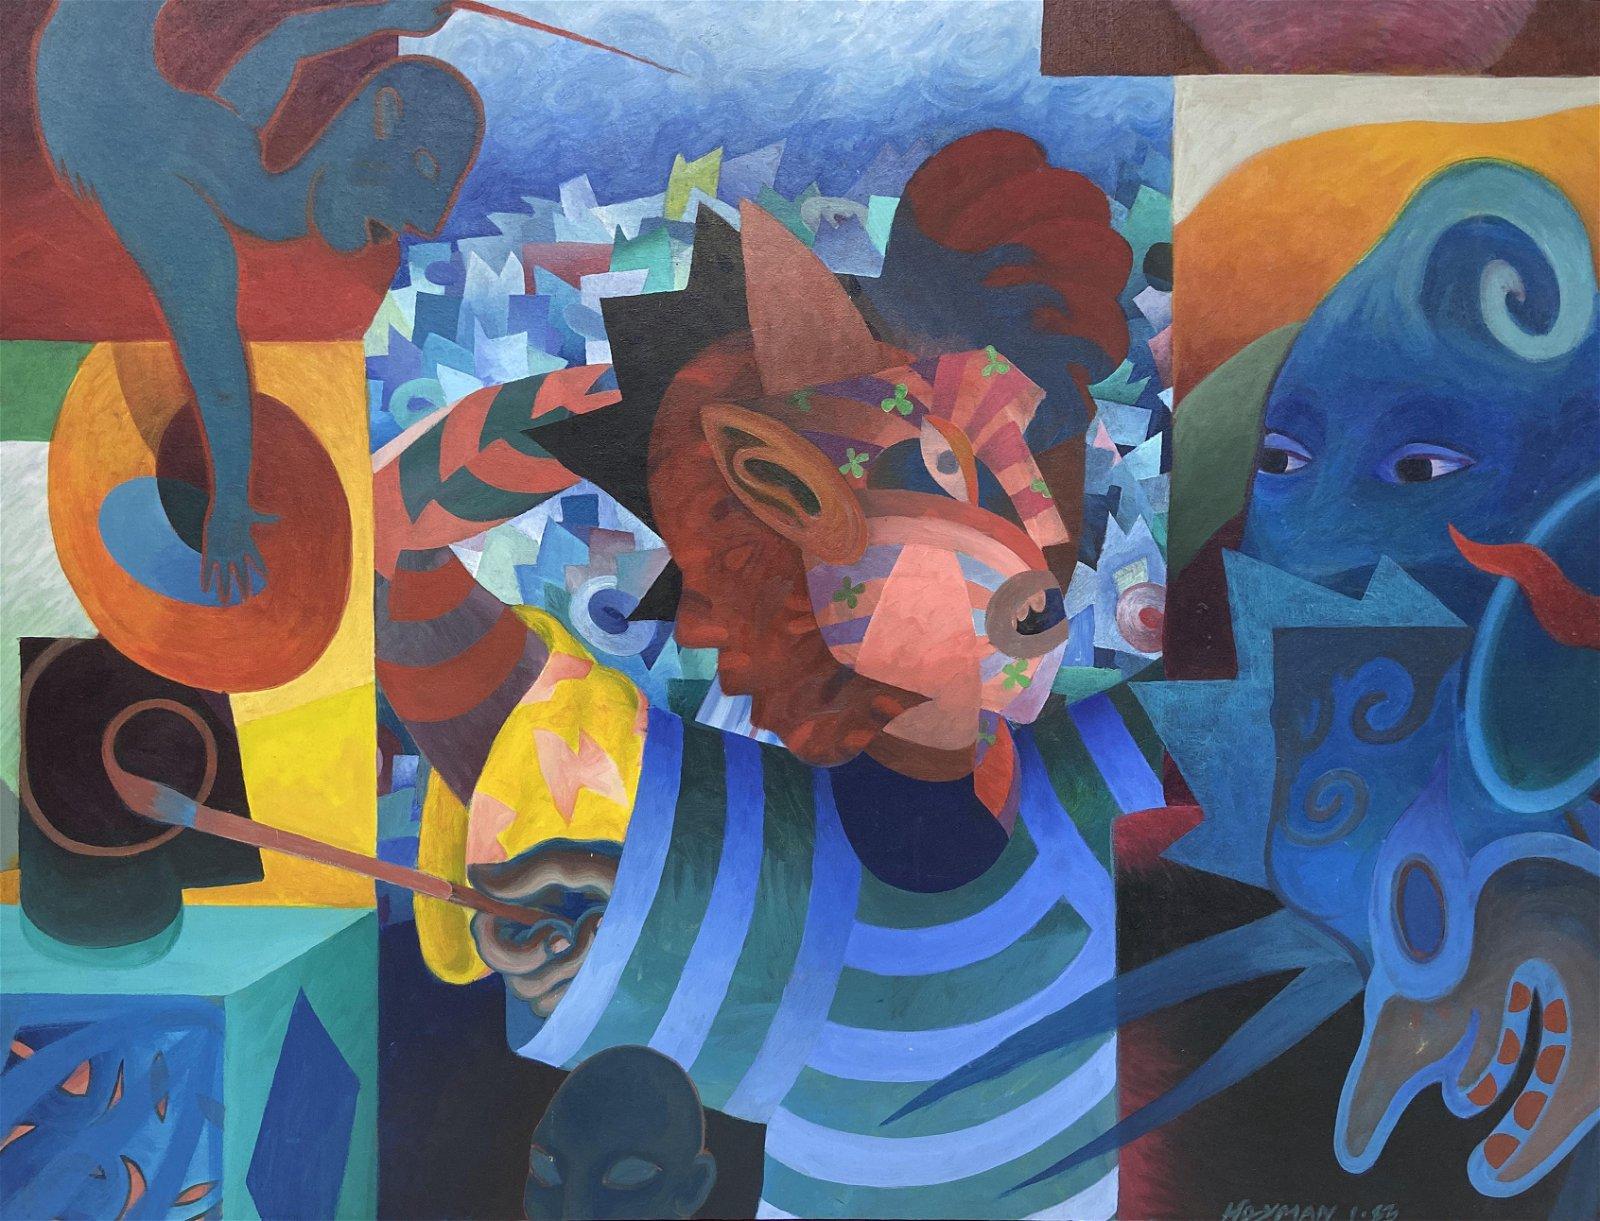 Large Steven Heyman Acrylic on Canvas Painting.